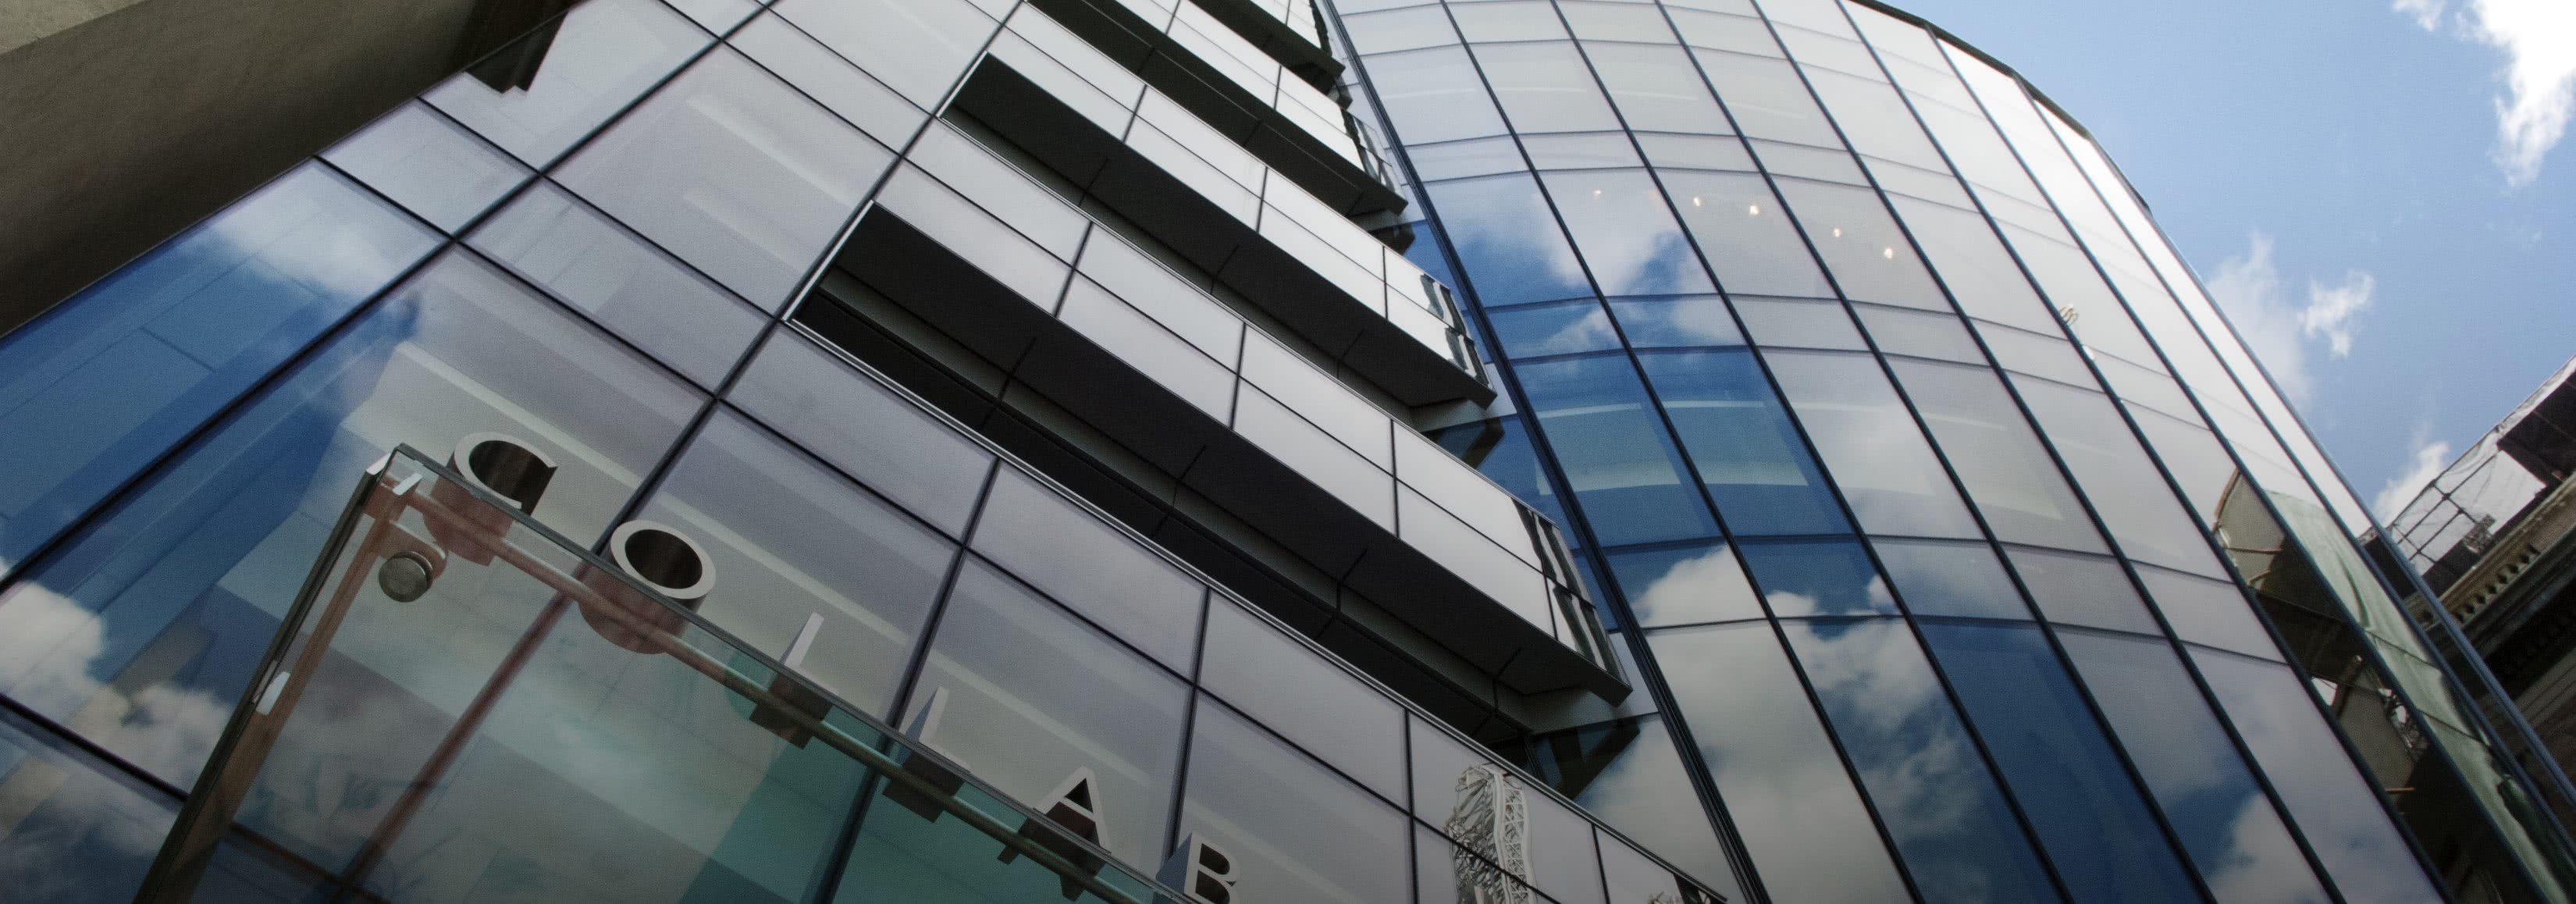 Greenberg building facade